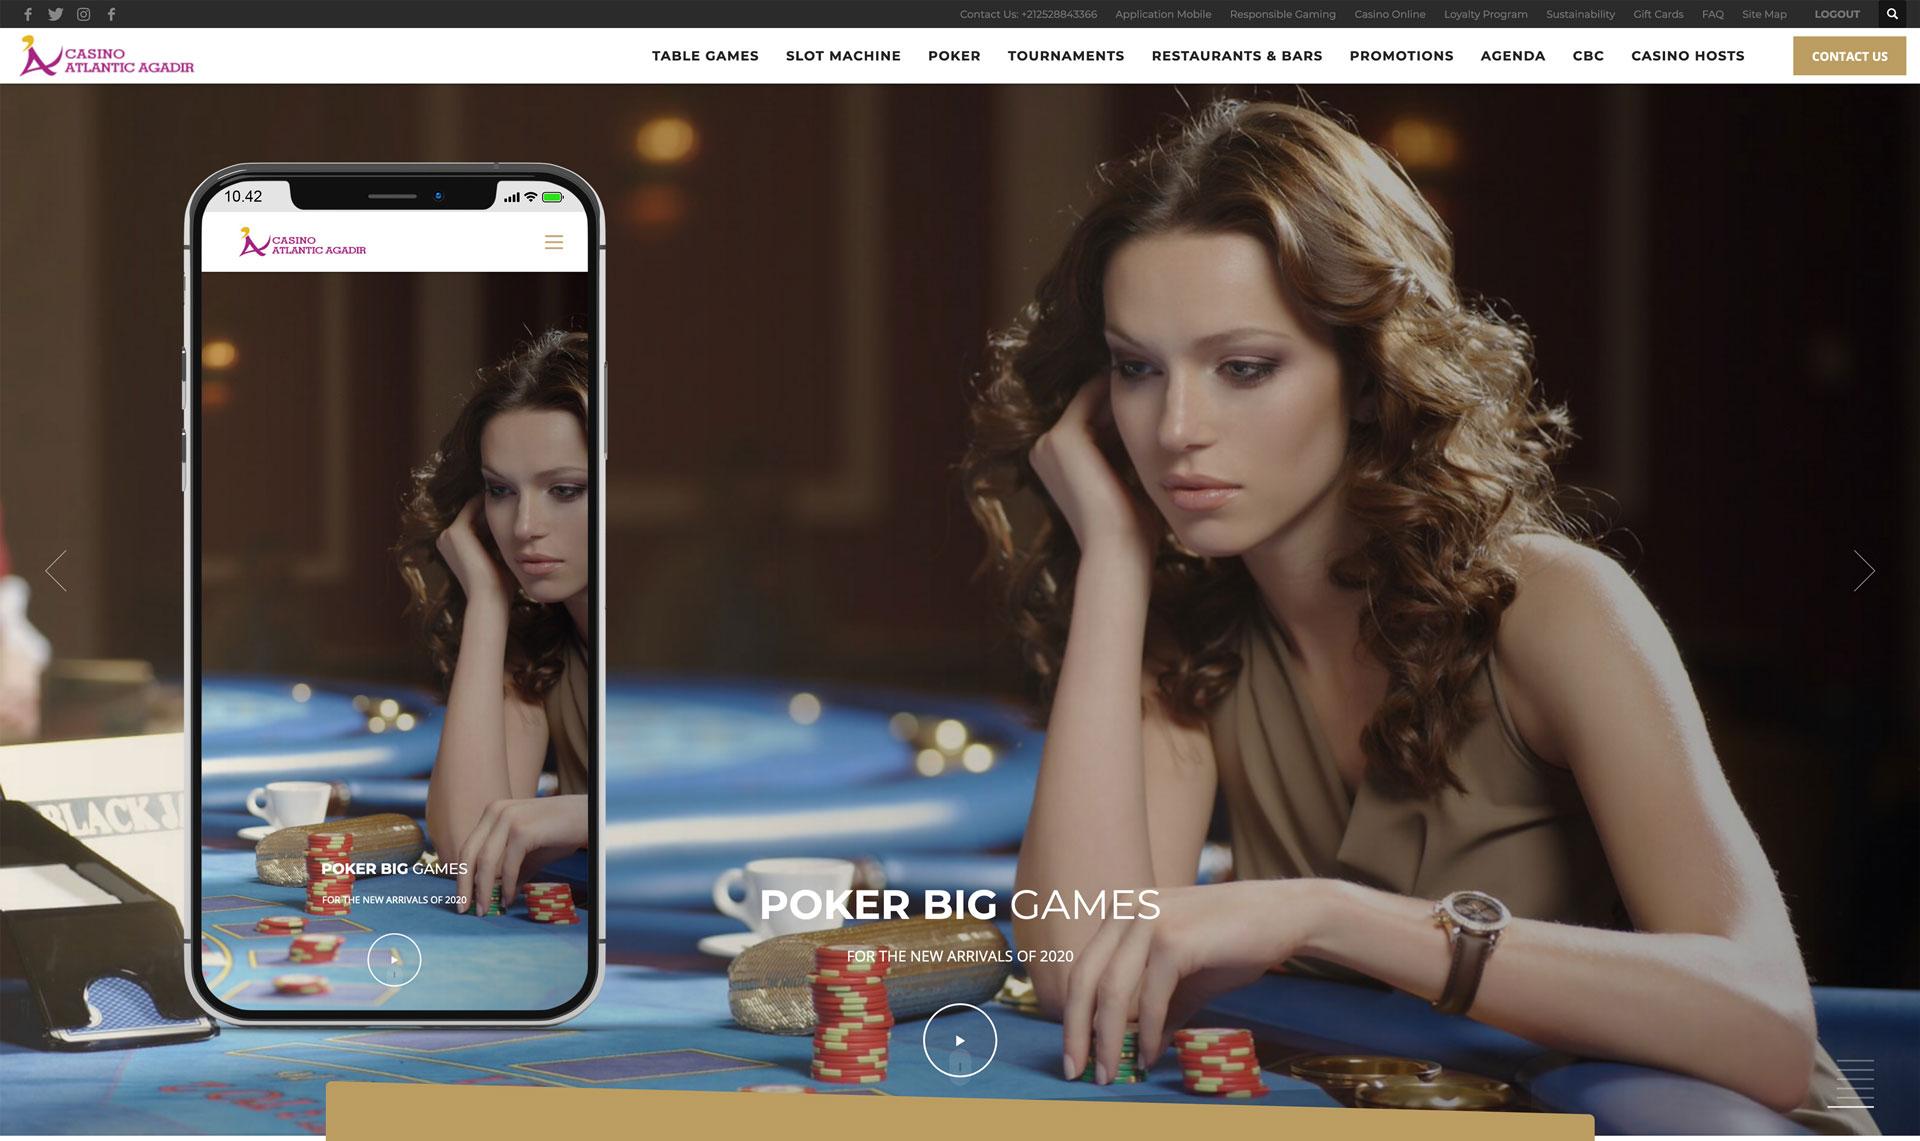 casino-atlantic-agadir-agence-communication-casablanca-maroc